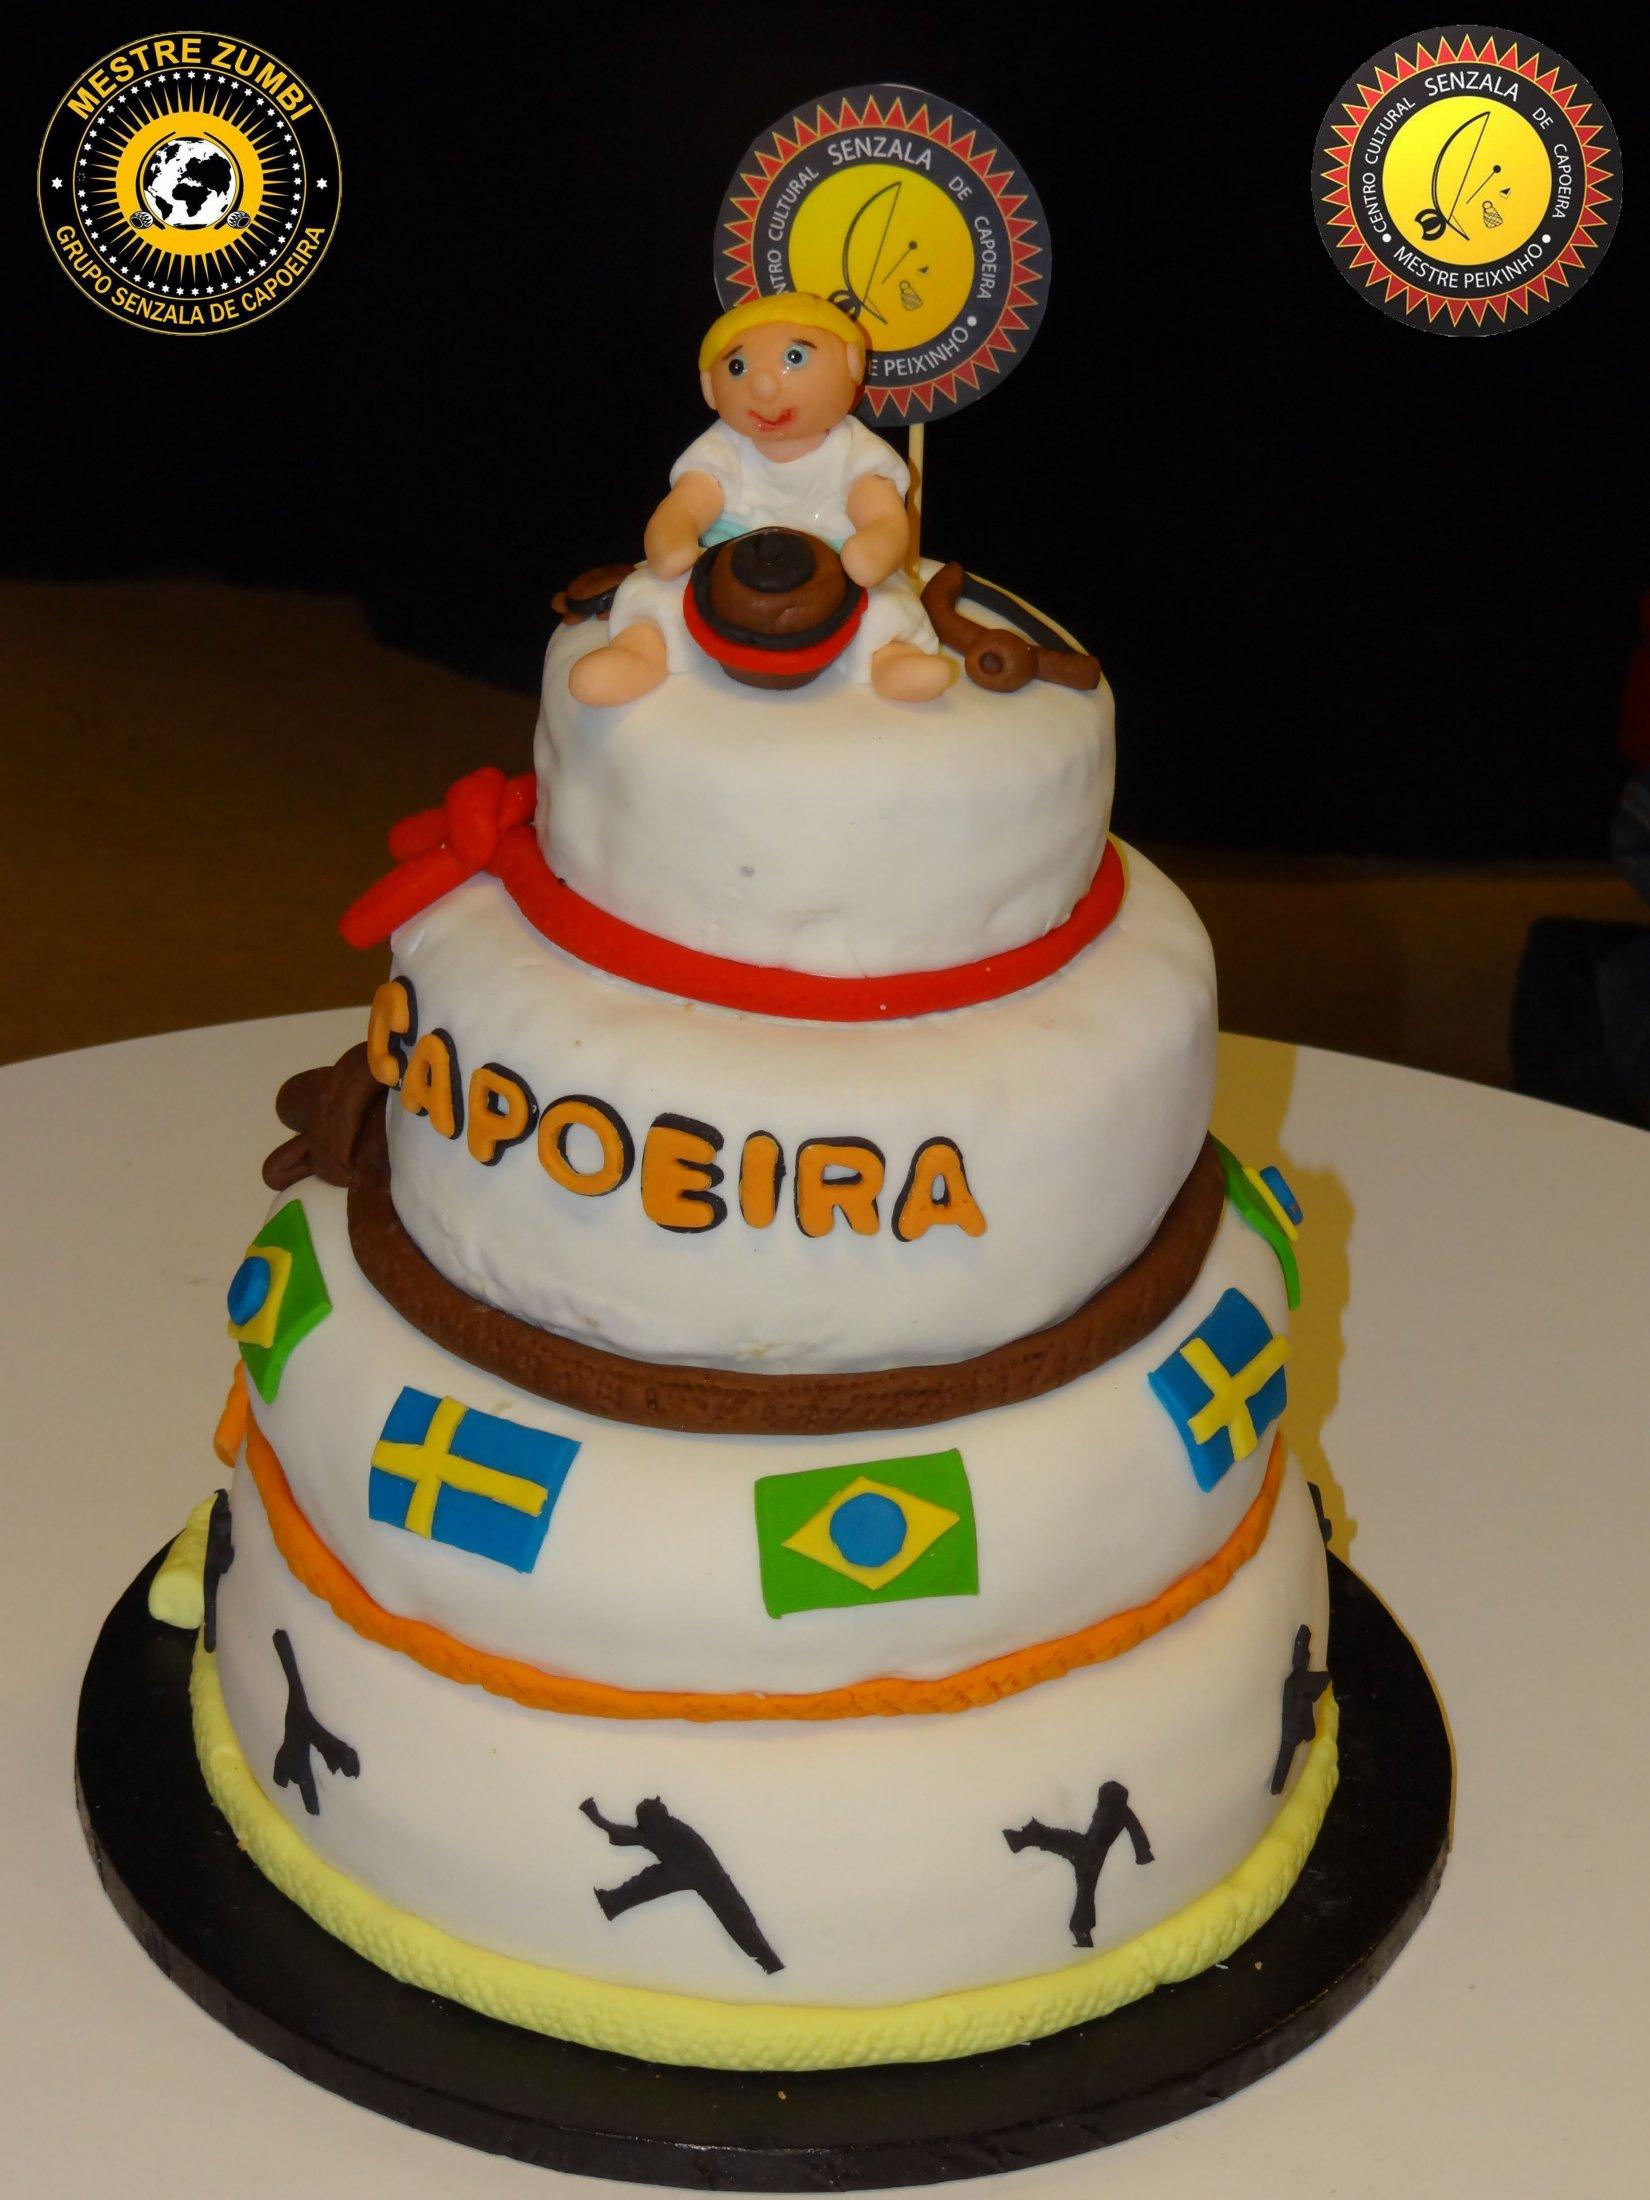 2013-12-14 - Capoeira 004